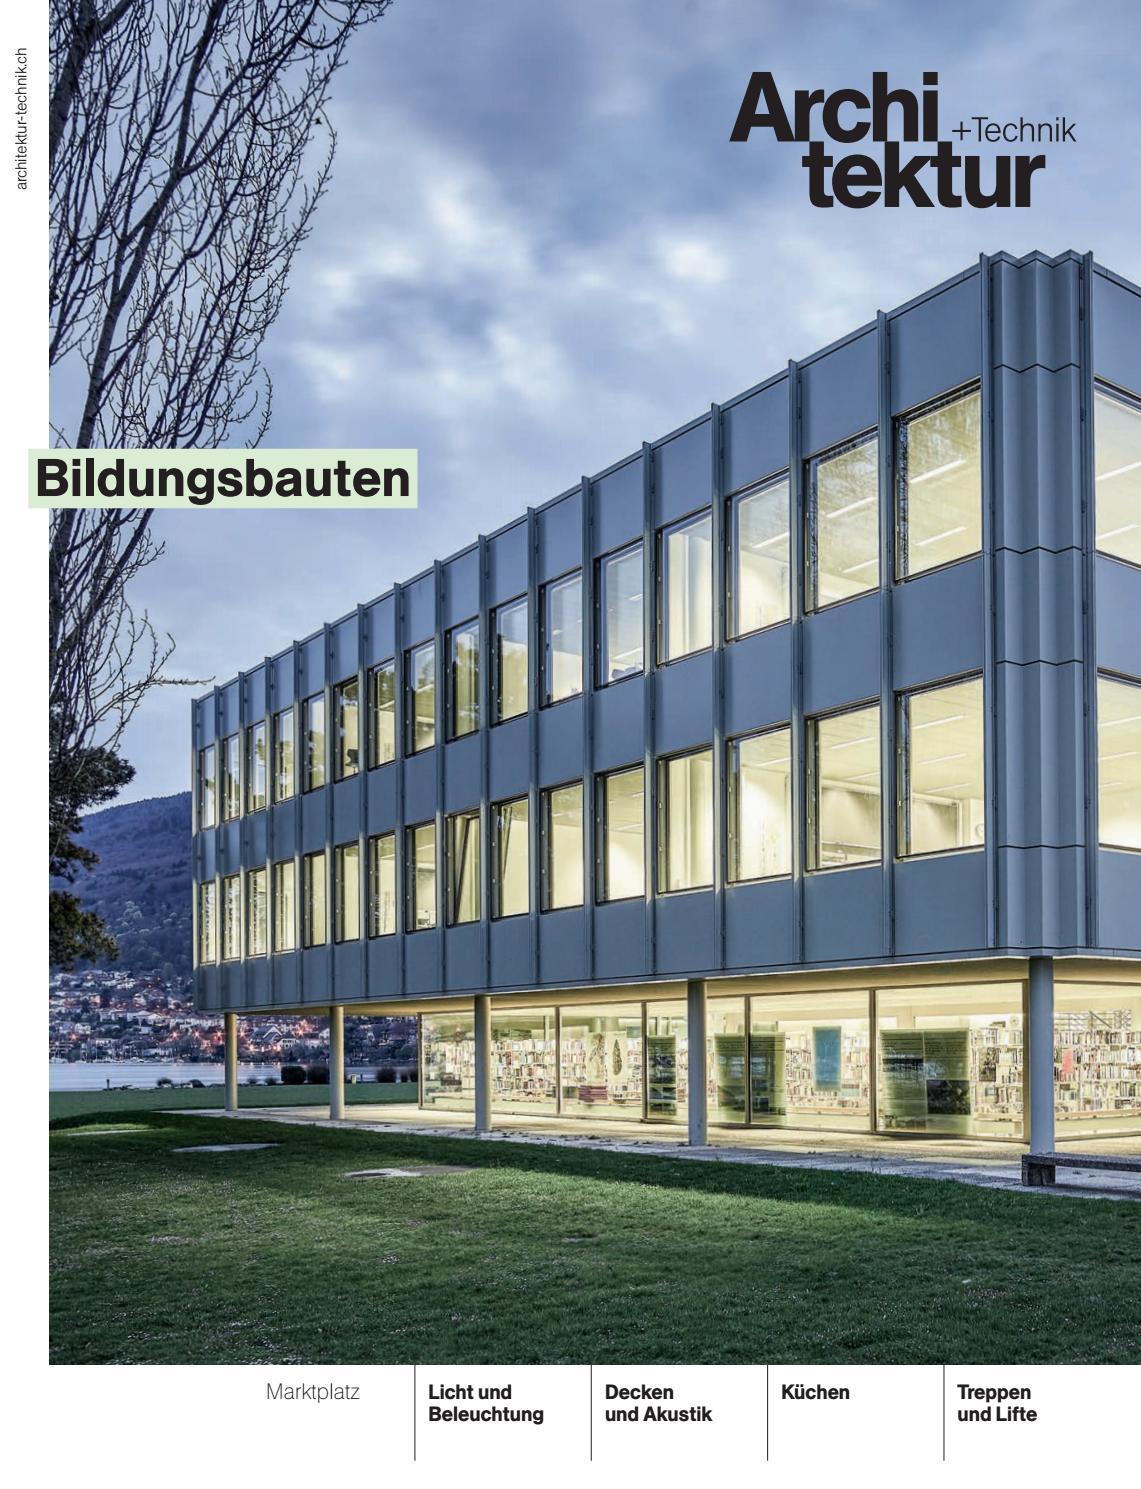 Architektur+Technik 06 2017 by BL Verlag AG - issuu